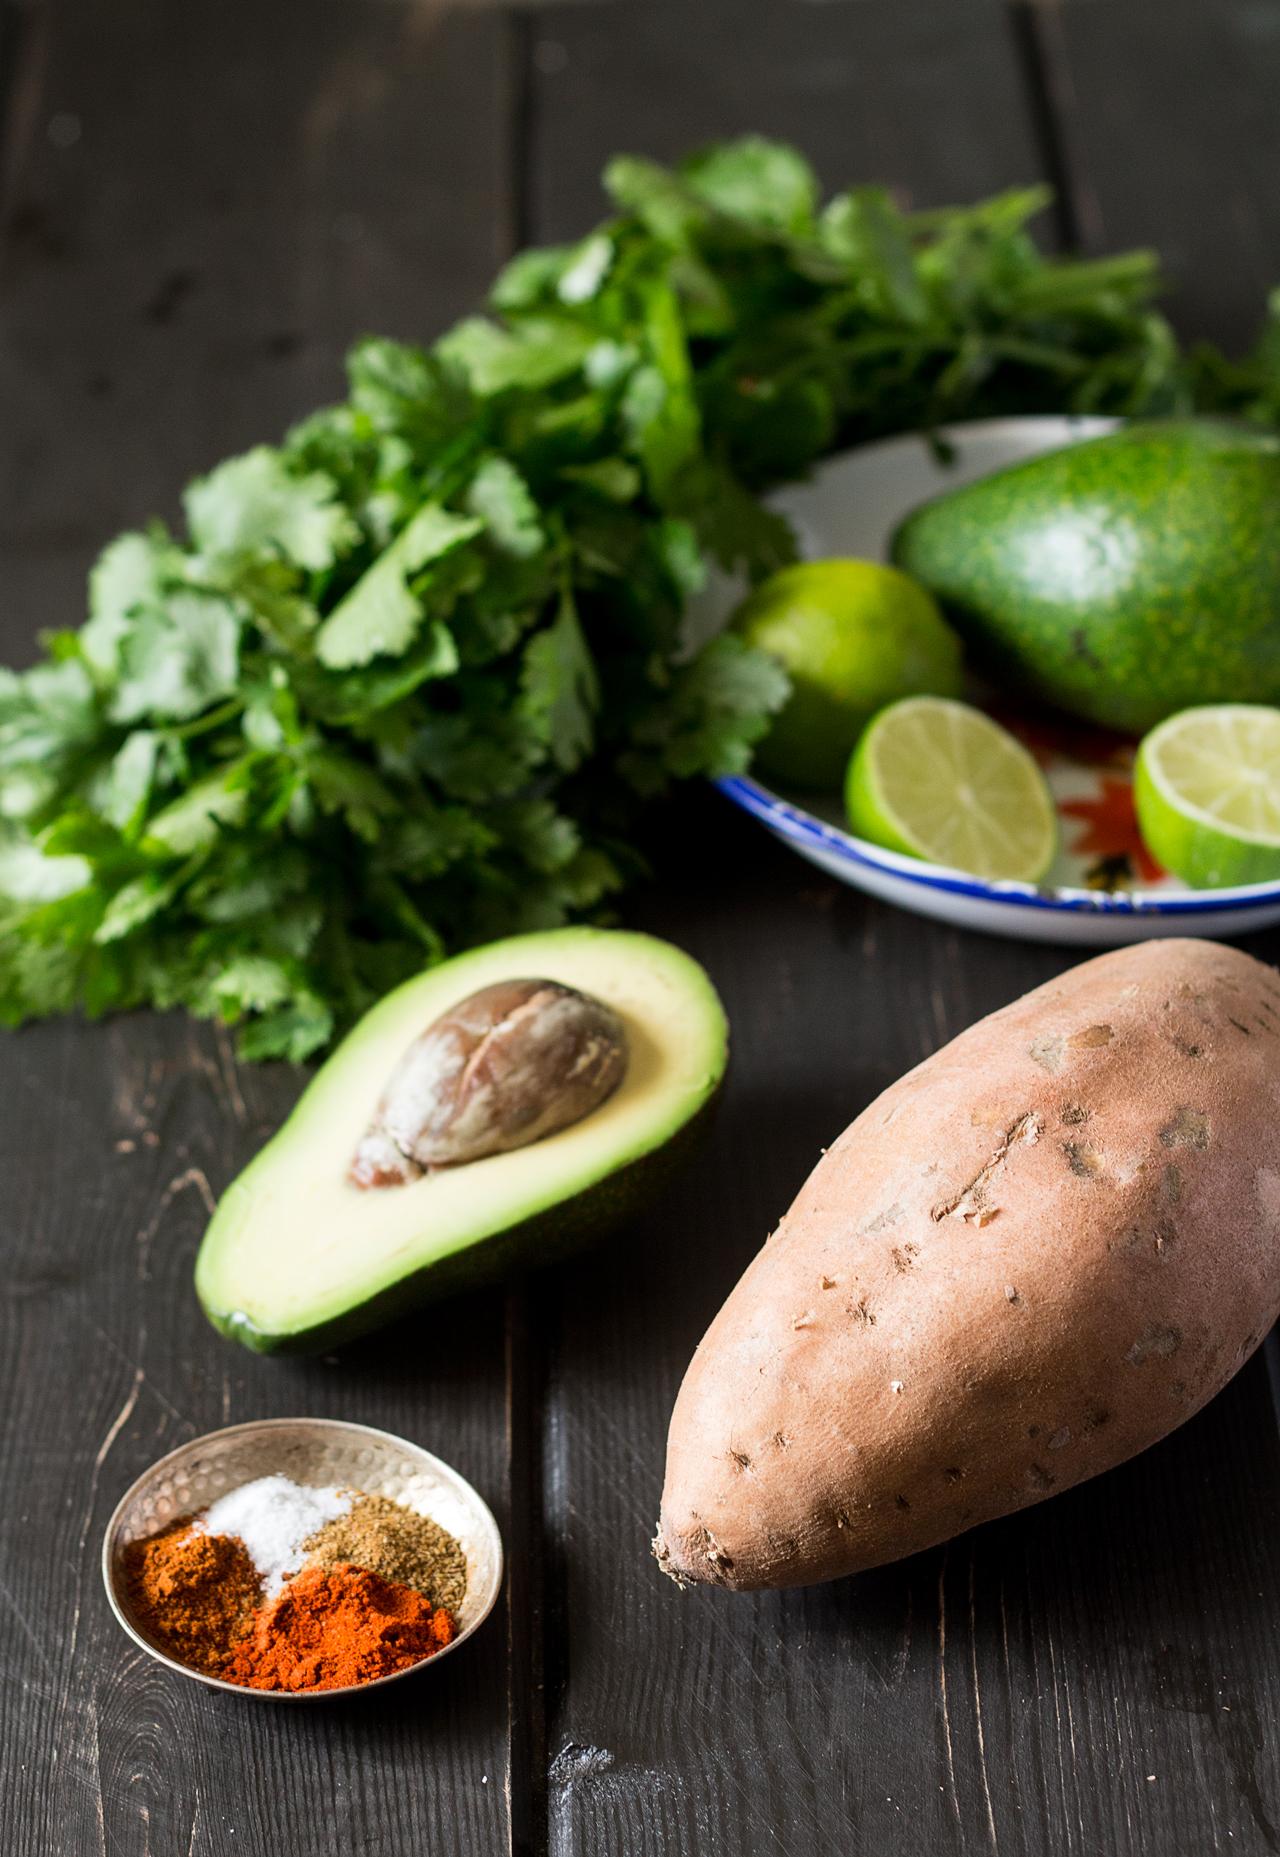 crispy-sweet-potato-fries-with-avocado-coriander-dip-ingredients